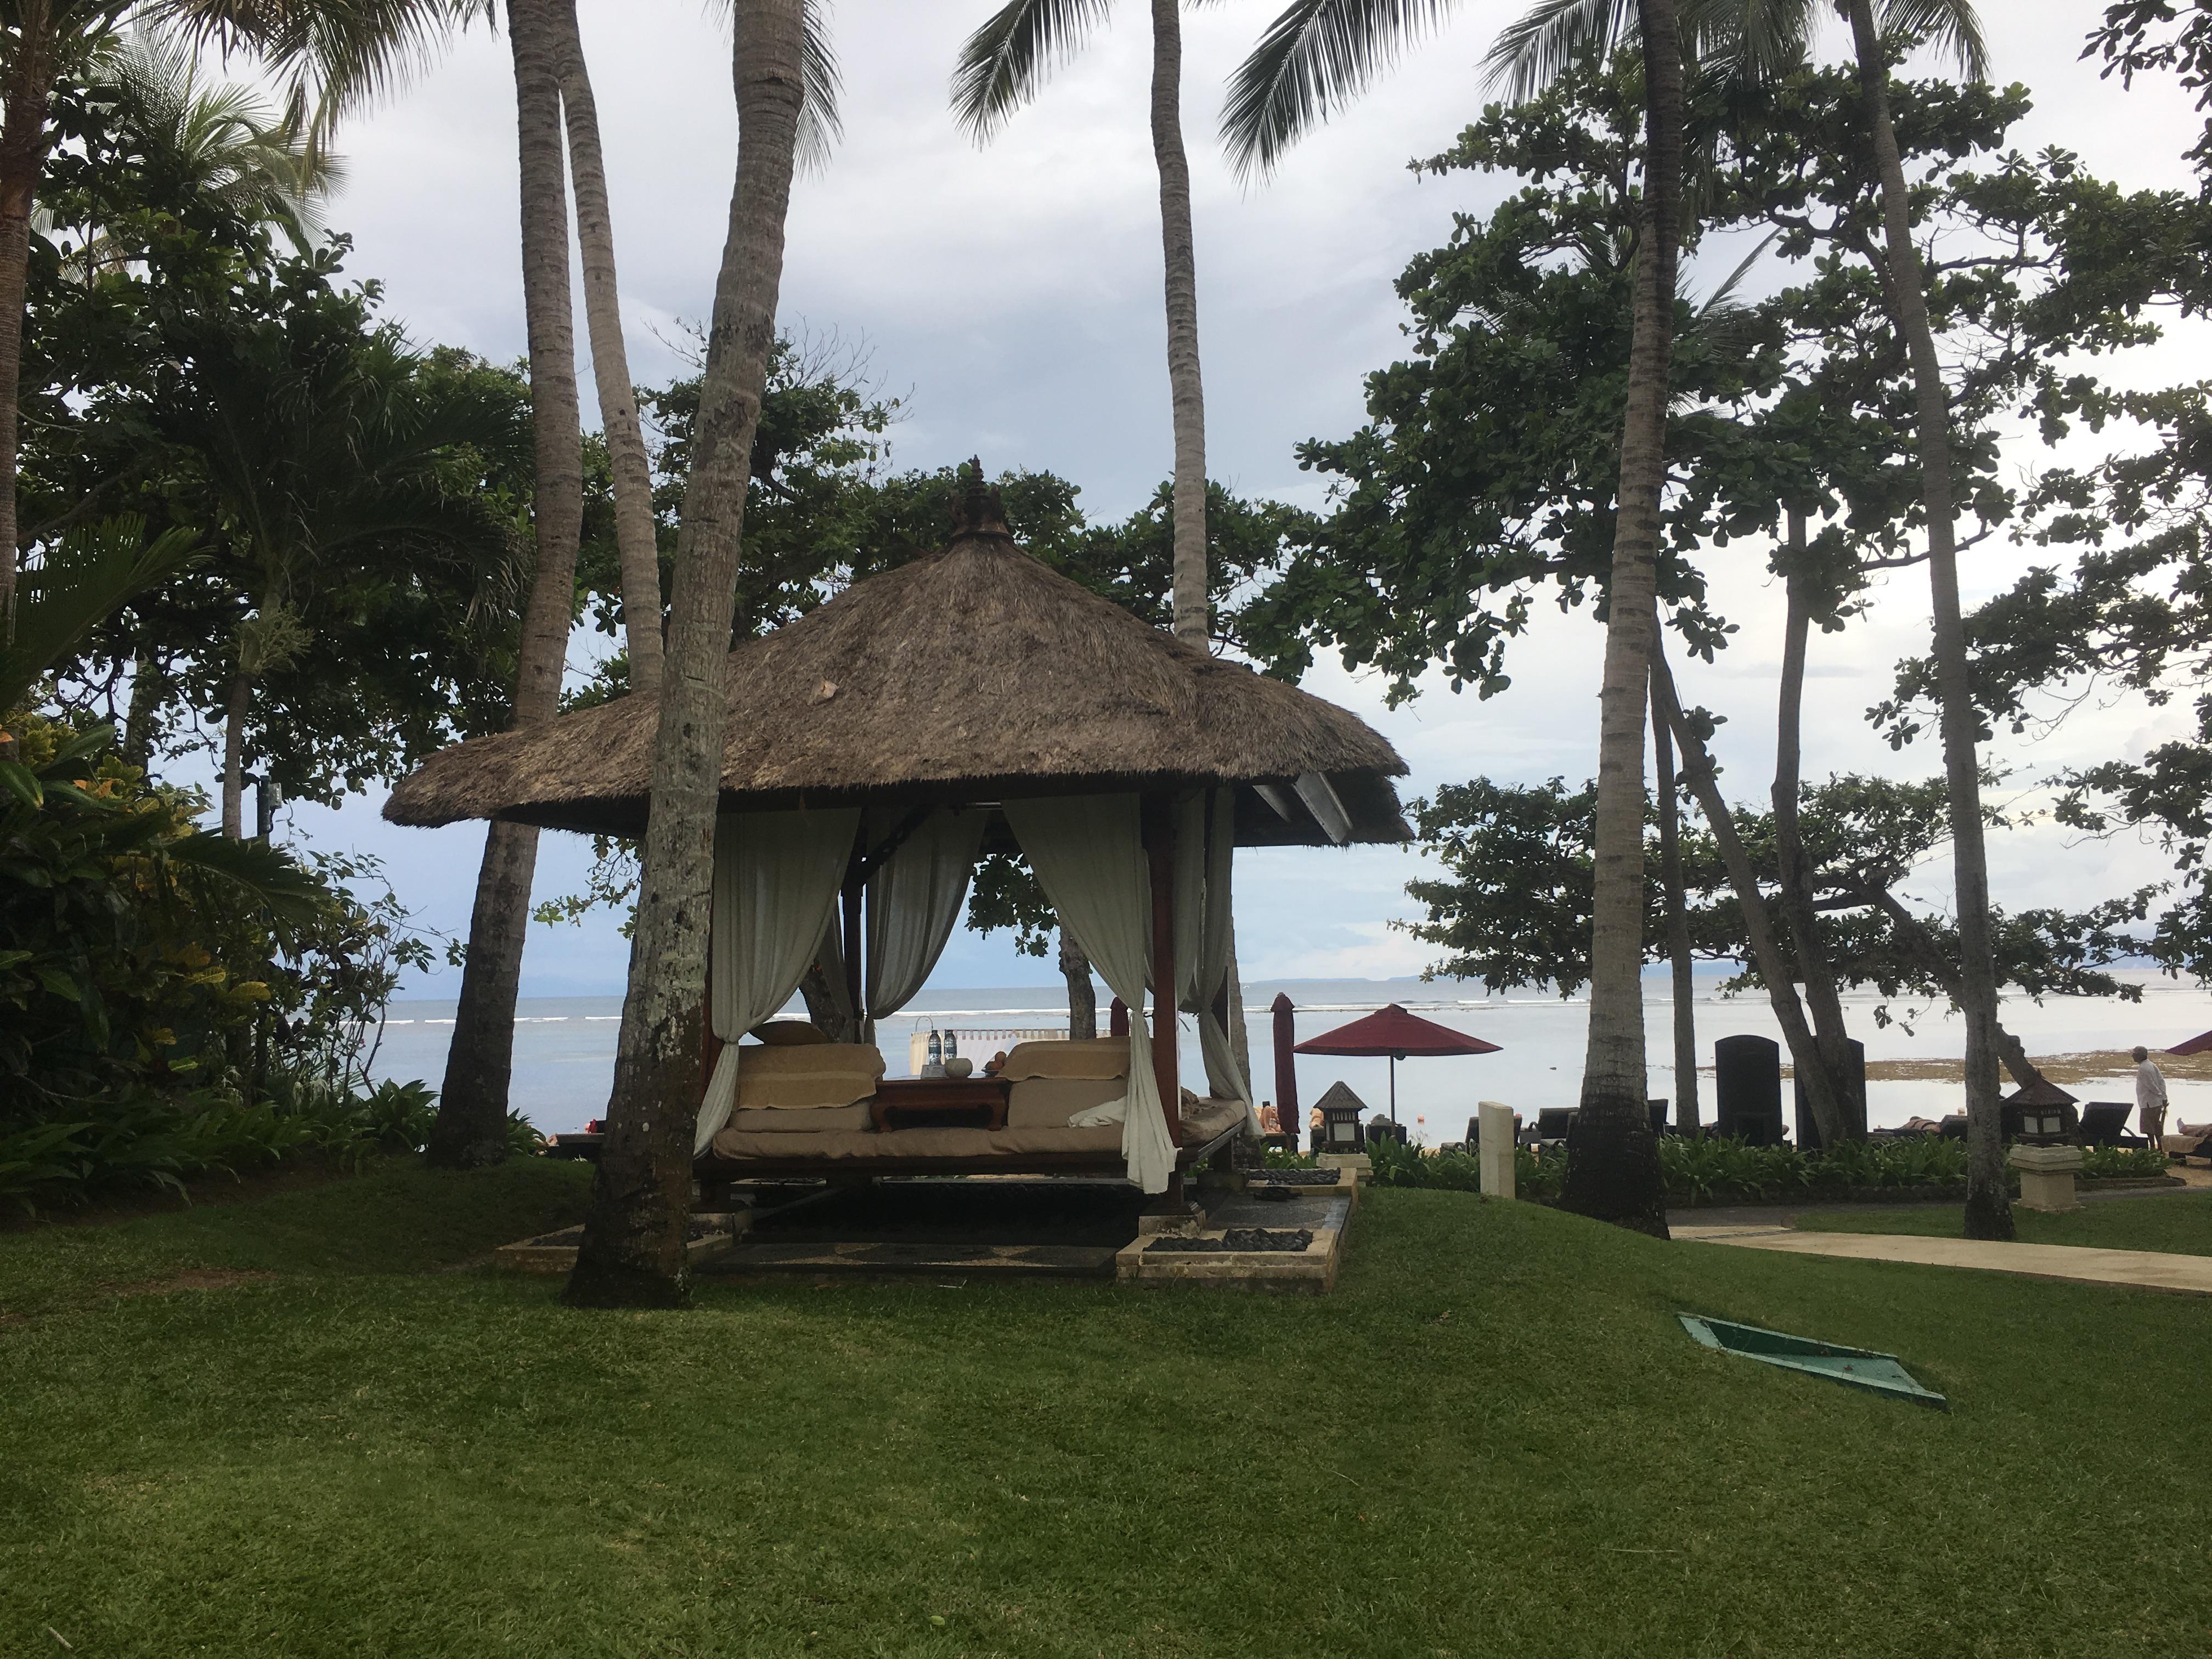 Beach Cabana at The Laguna Luxury Collection Resort in Nusa Dua Bali Indonesia